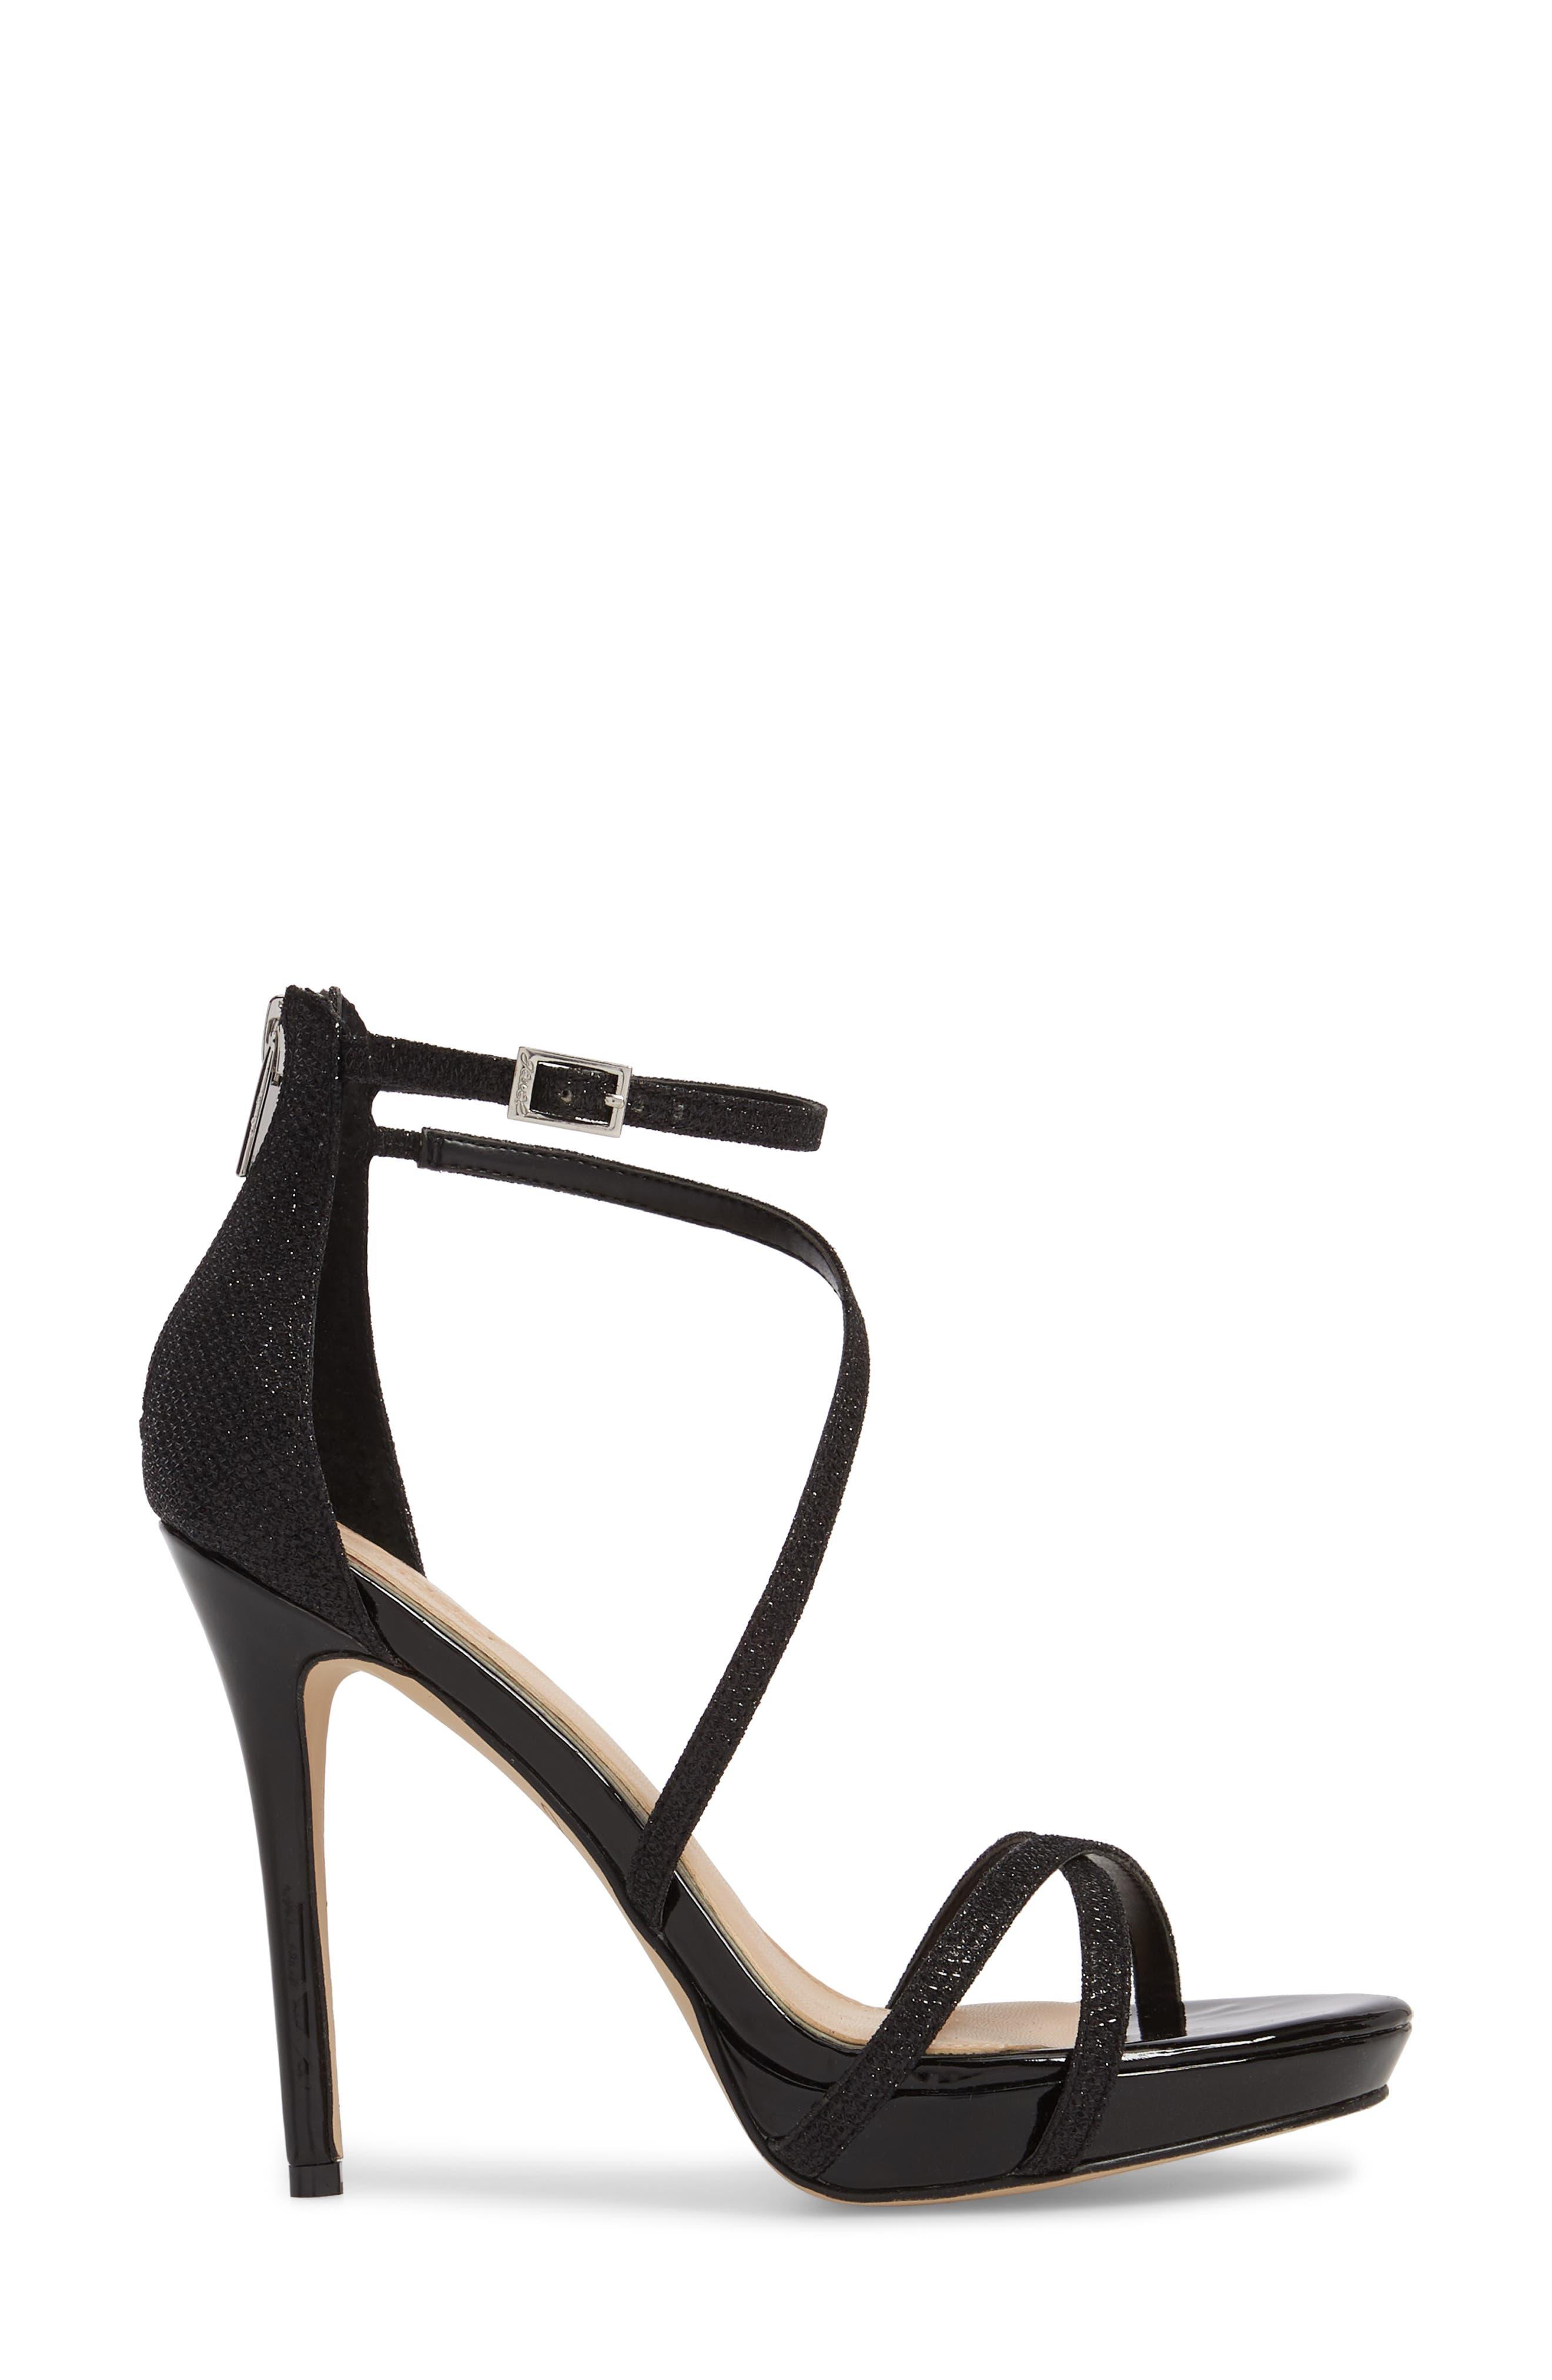 JEWEL BADGLEY MISCHKA, Galen Strappy Platform Sandal, Alternate thumbnail 3, color, BLACK GLITTER FABRIC